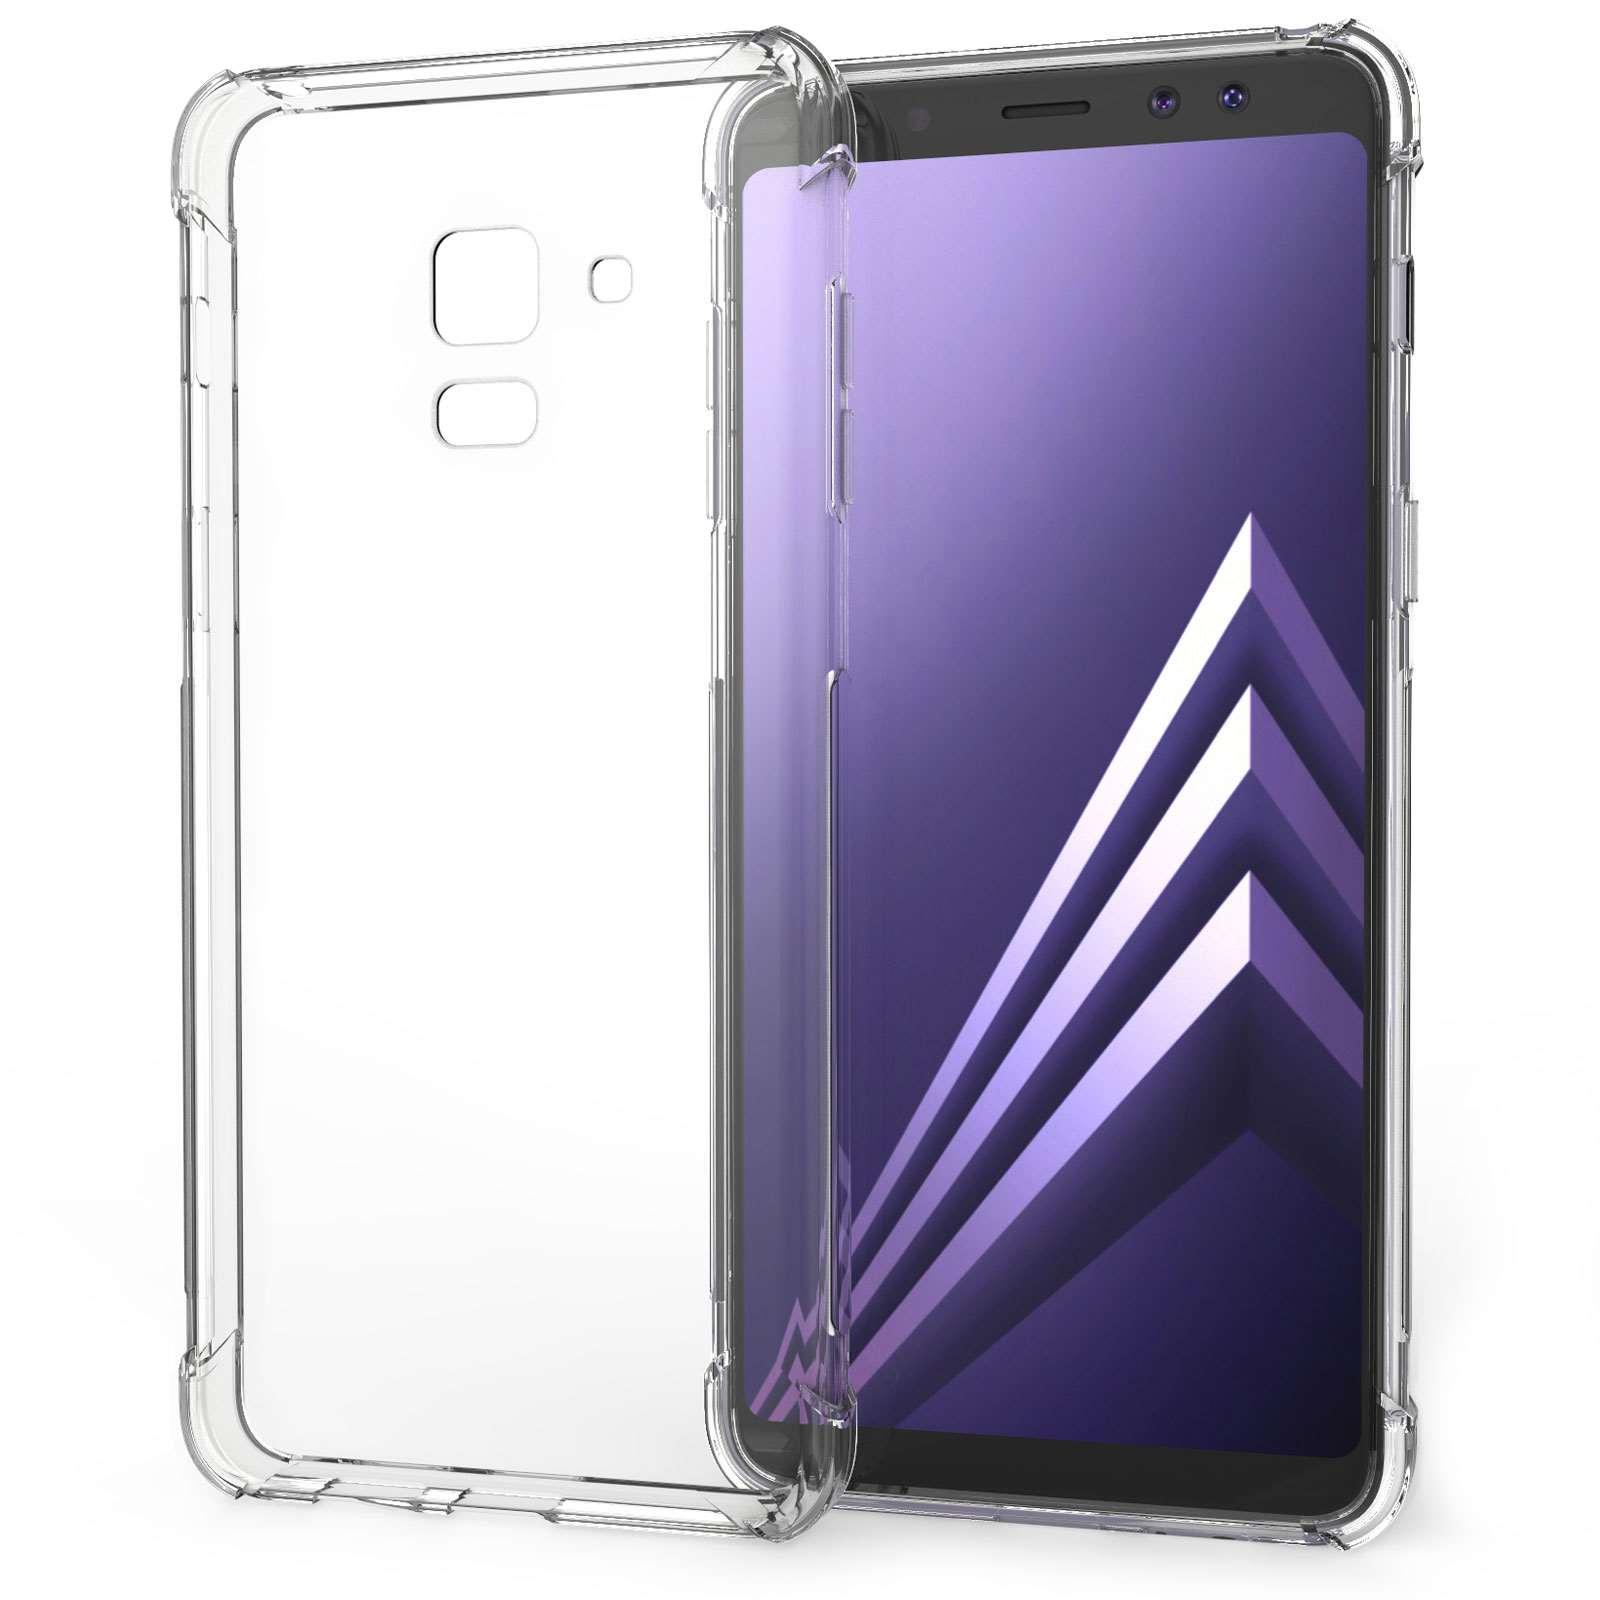 Caseflex Θήκη Σιλικόνης Samsung A8 Plus 2018 - Clear & Screen Protector (SA-EA10-Z321)